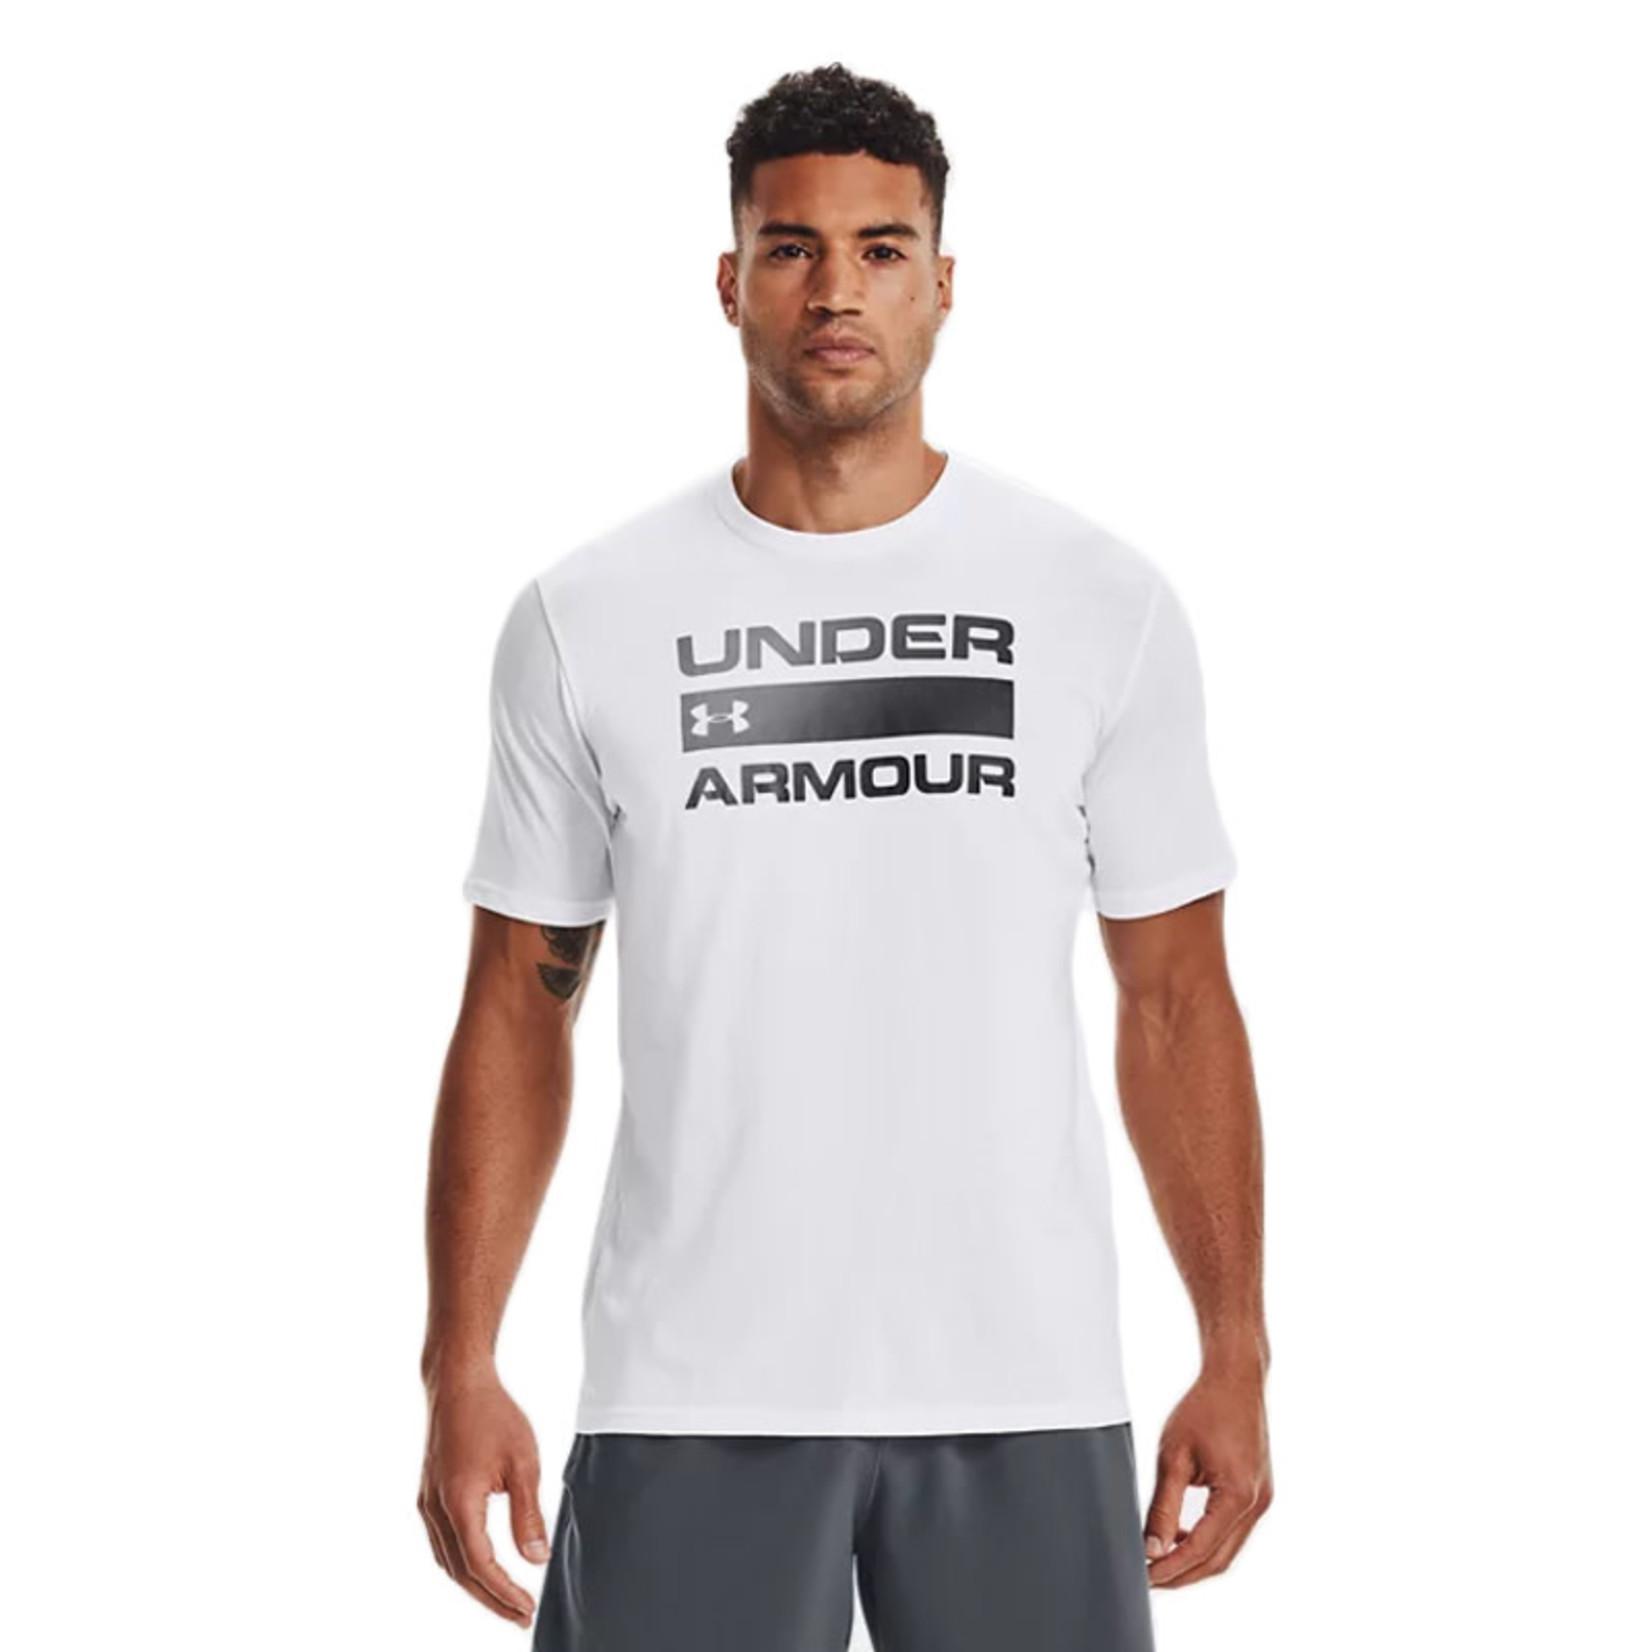 Under Armour Under Armour T-Shirt, Team Issue Wordmark, Mens